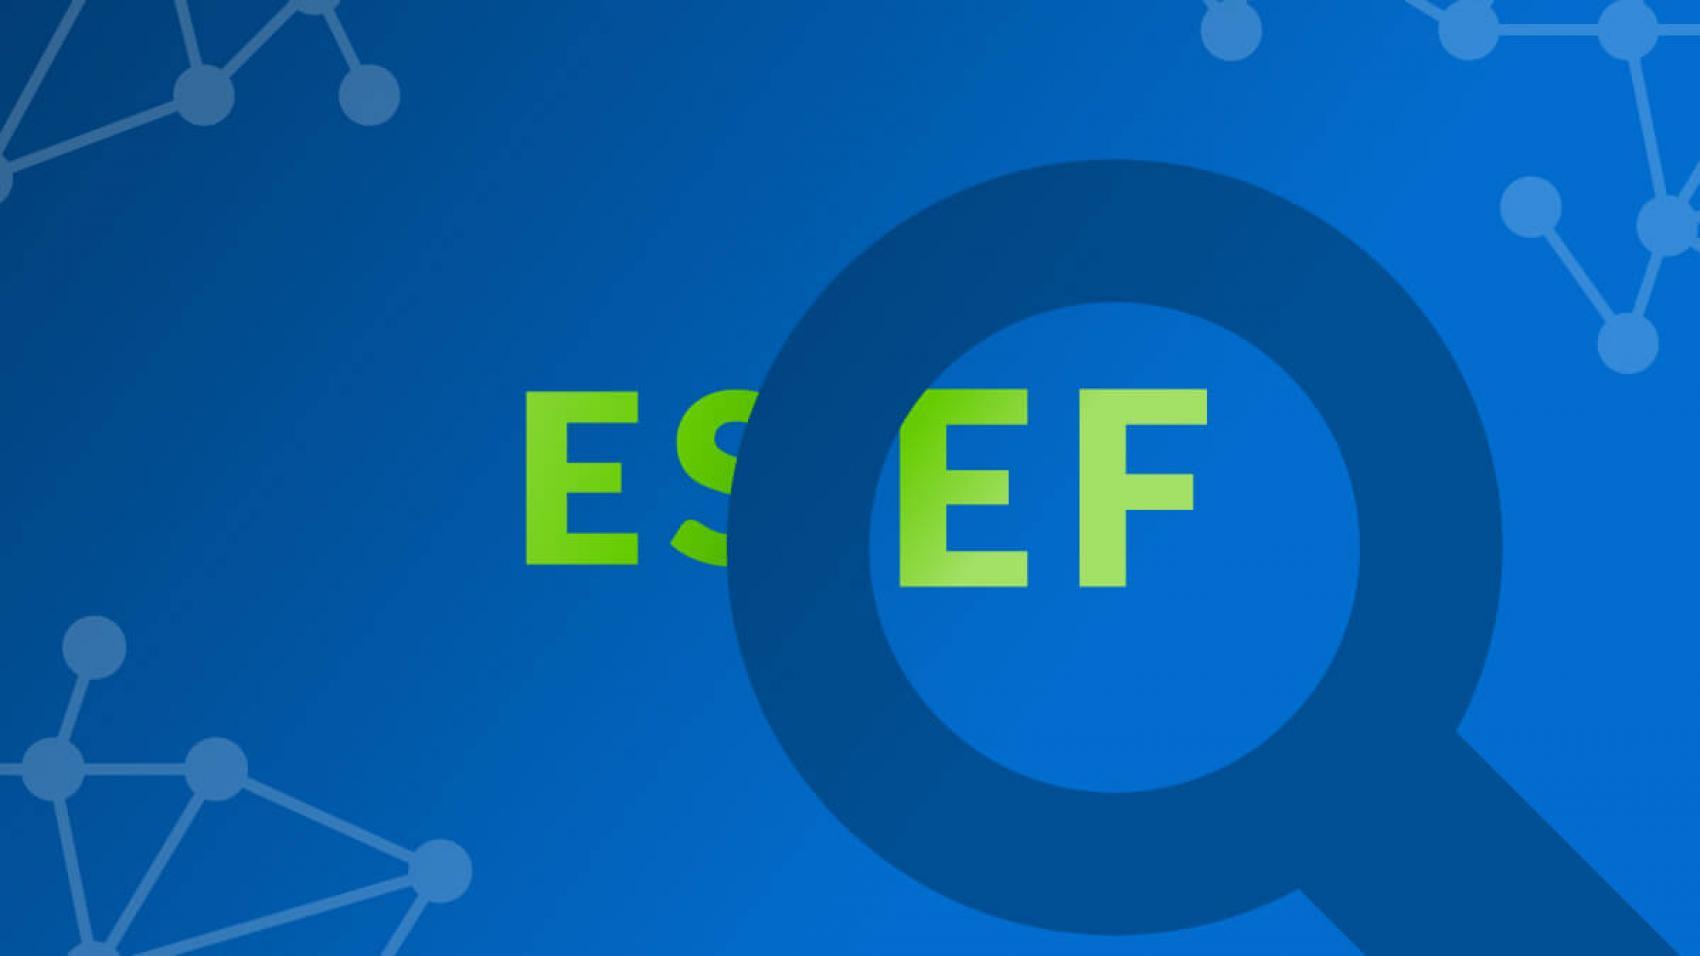 workiva-blog-esef-xbrl-financial-services-en.jpg